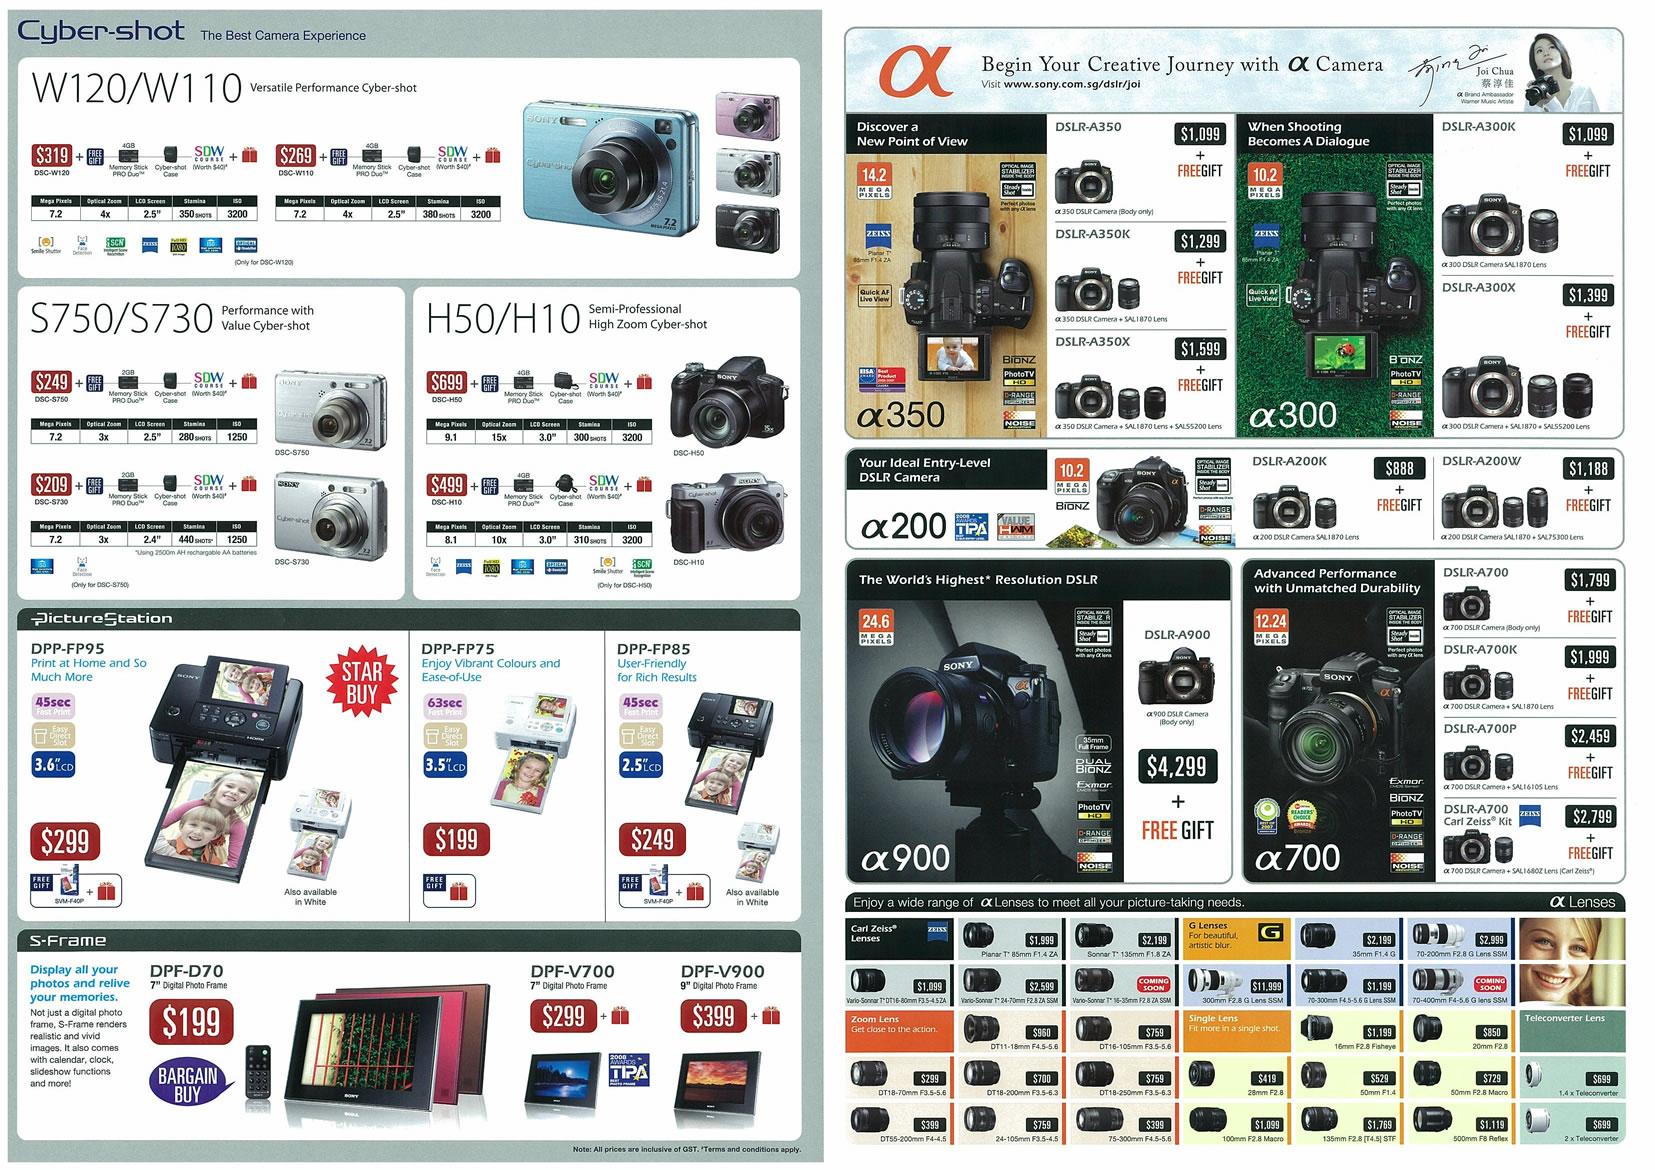 ... Cybershot Alpha Page 2 Vr Zone Tclong SITEX 2008 Price List Brochure